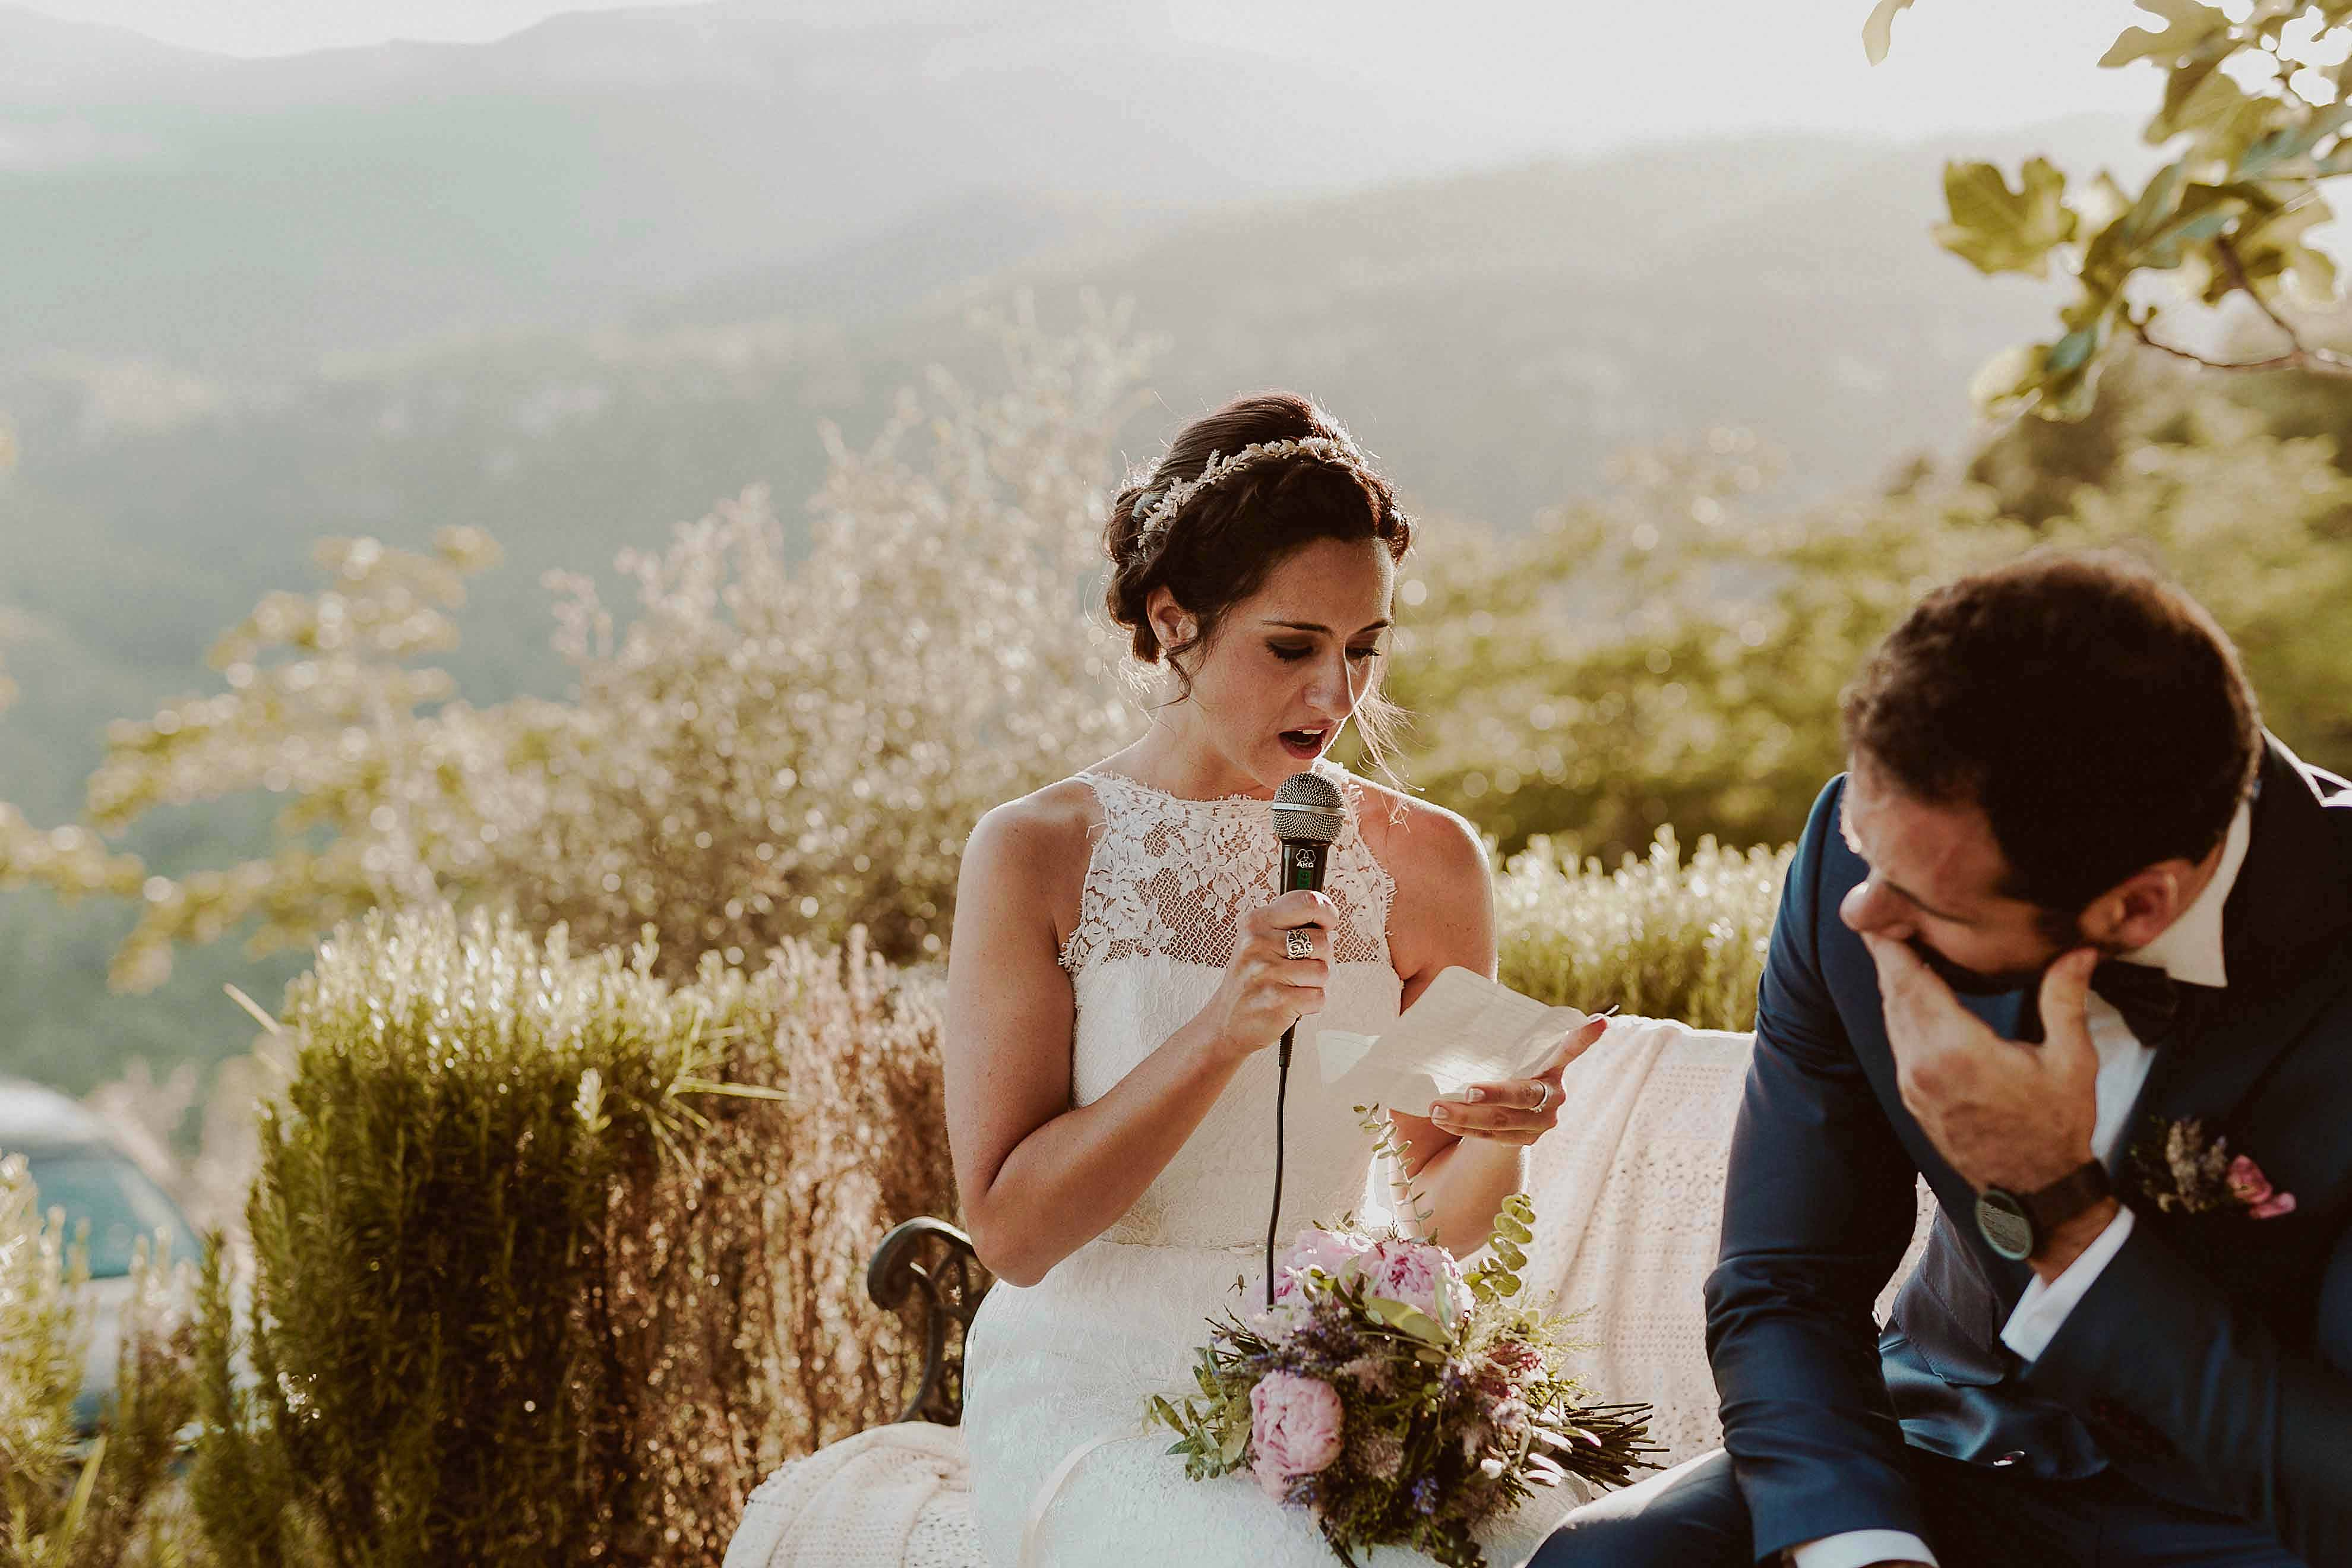 Boda rústica en la montaña. fotgrafo de bodas barcelona_057